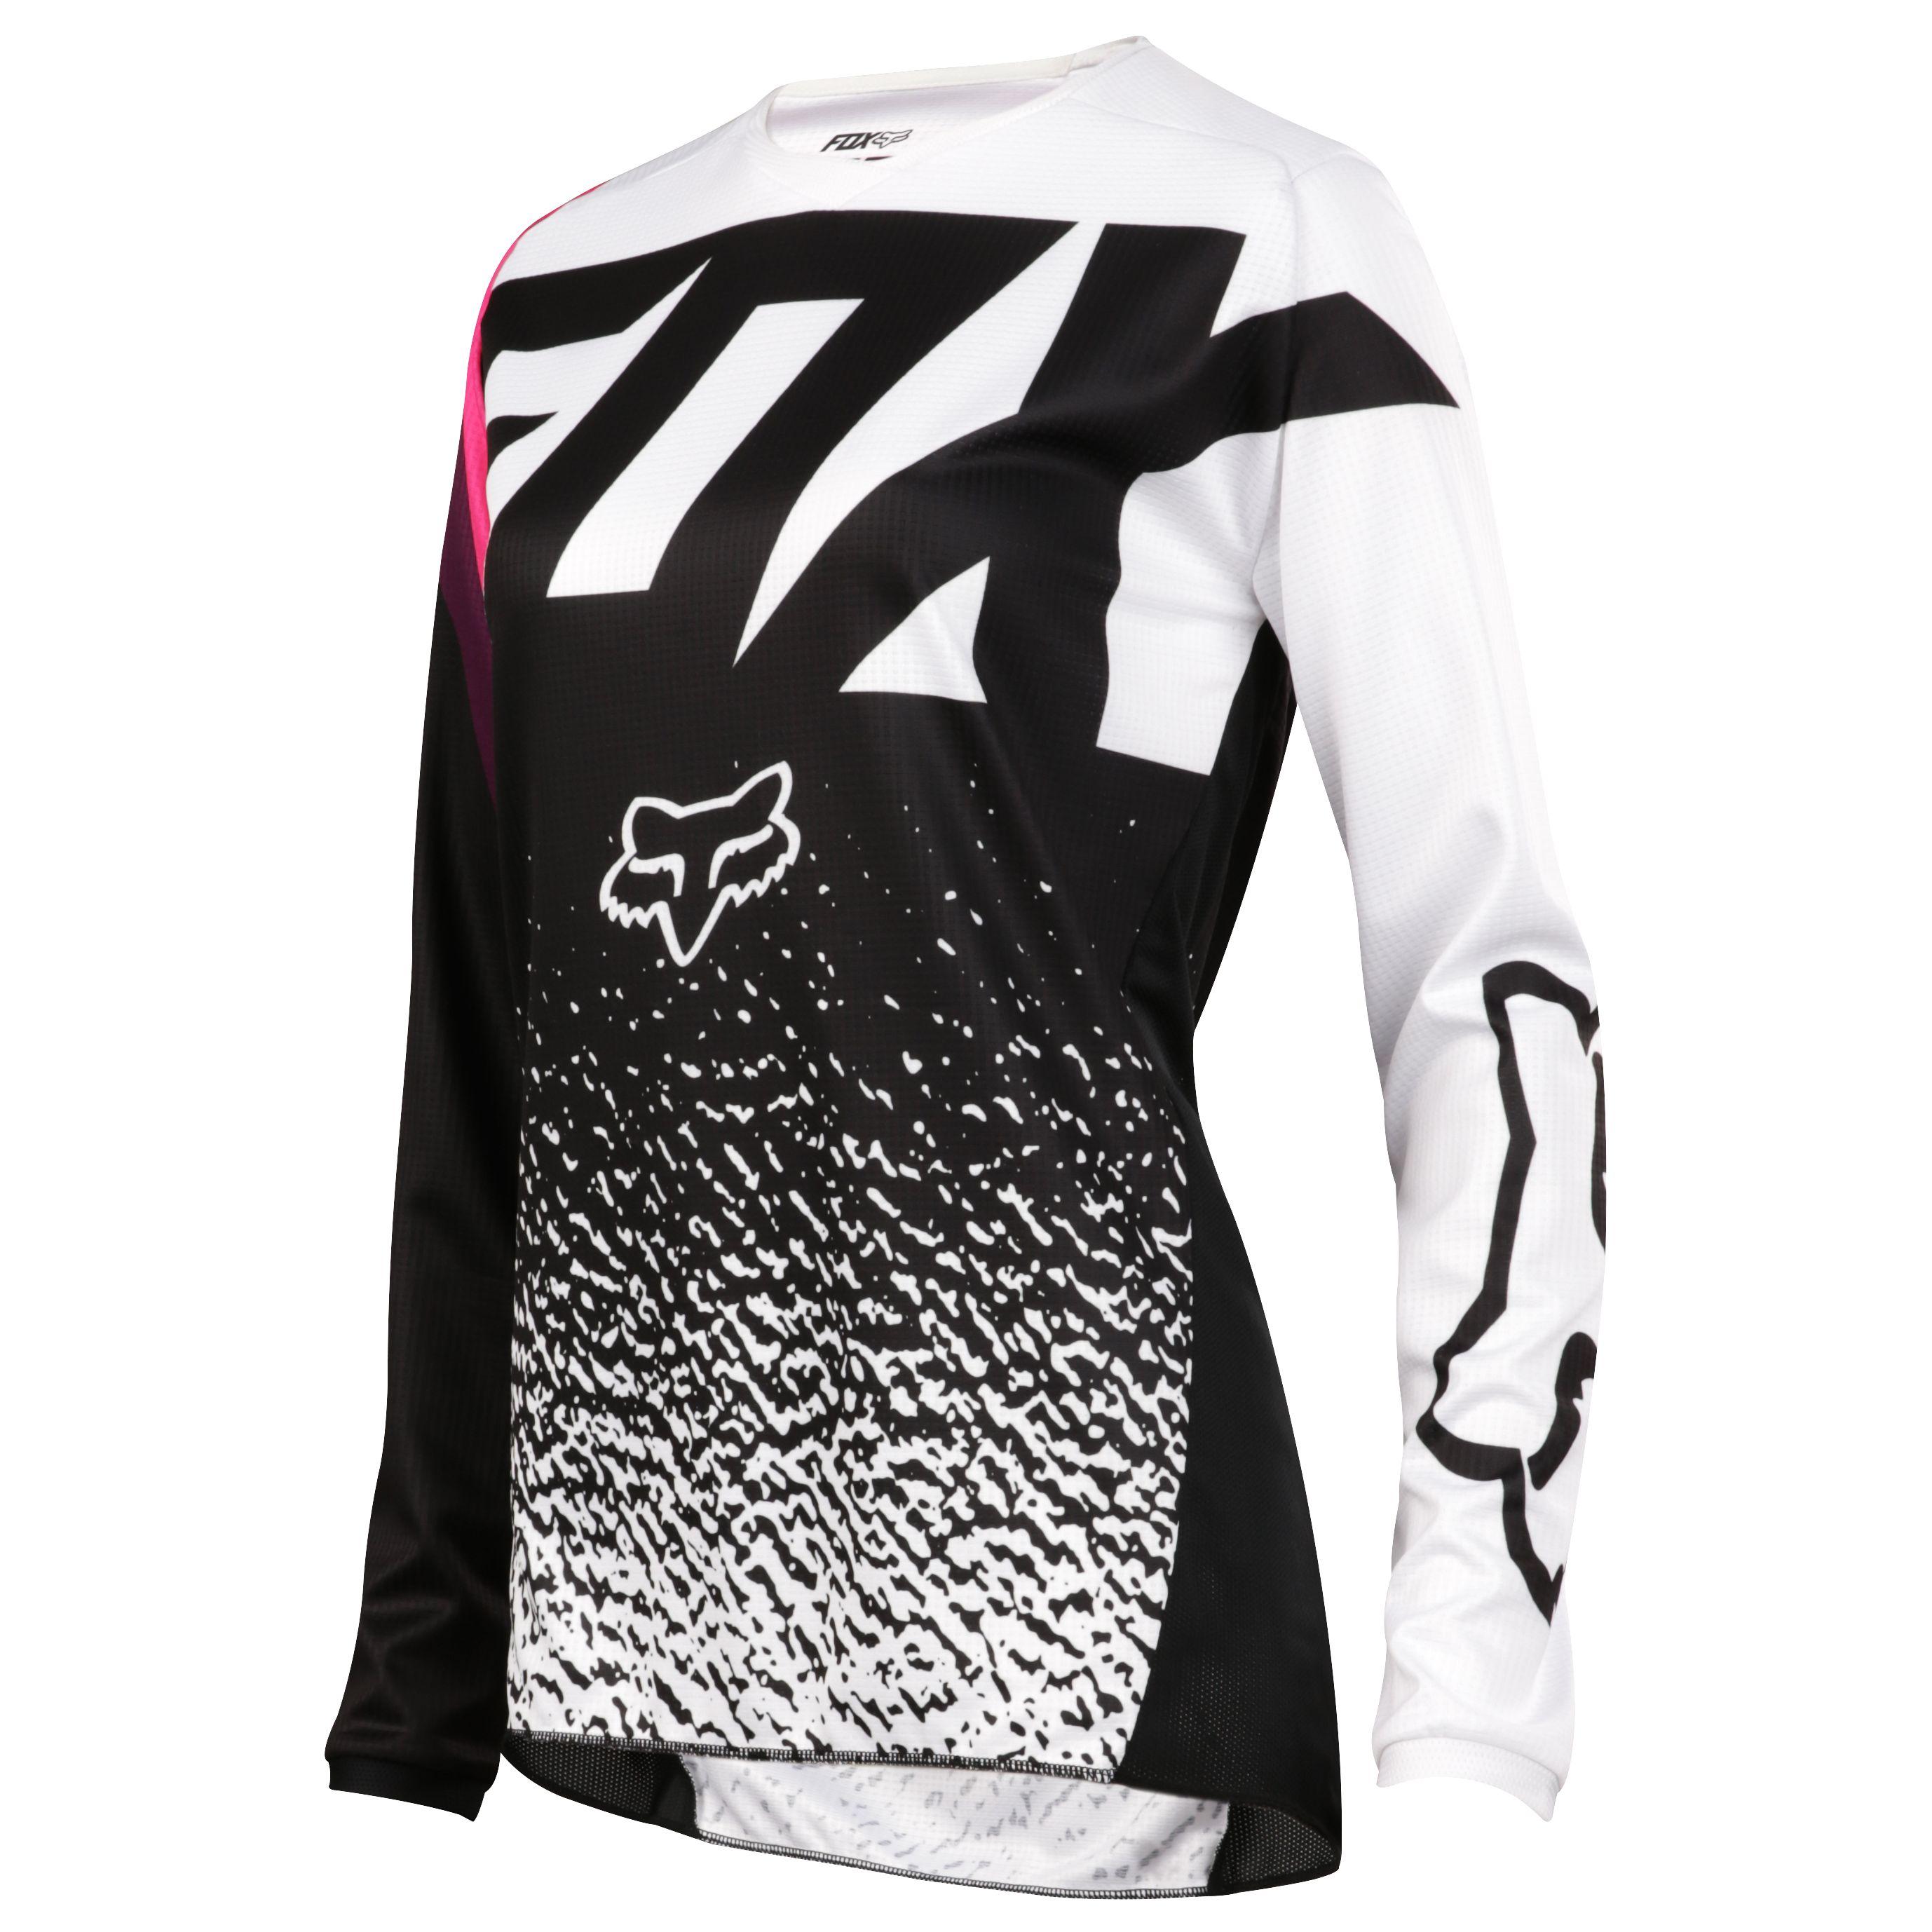 Camiseta de motocross Fox 180 YOUTH GIRLS - NEGRO ROSA ... 50a8a5f9ec7